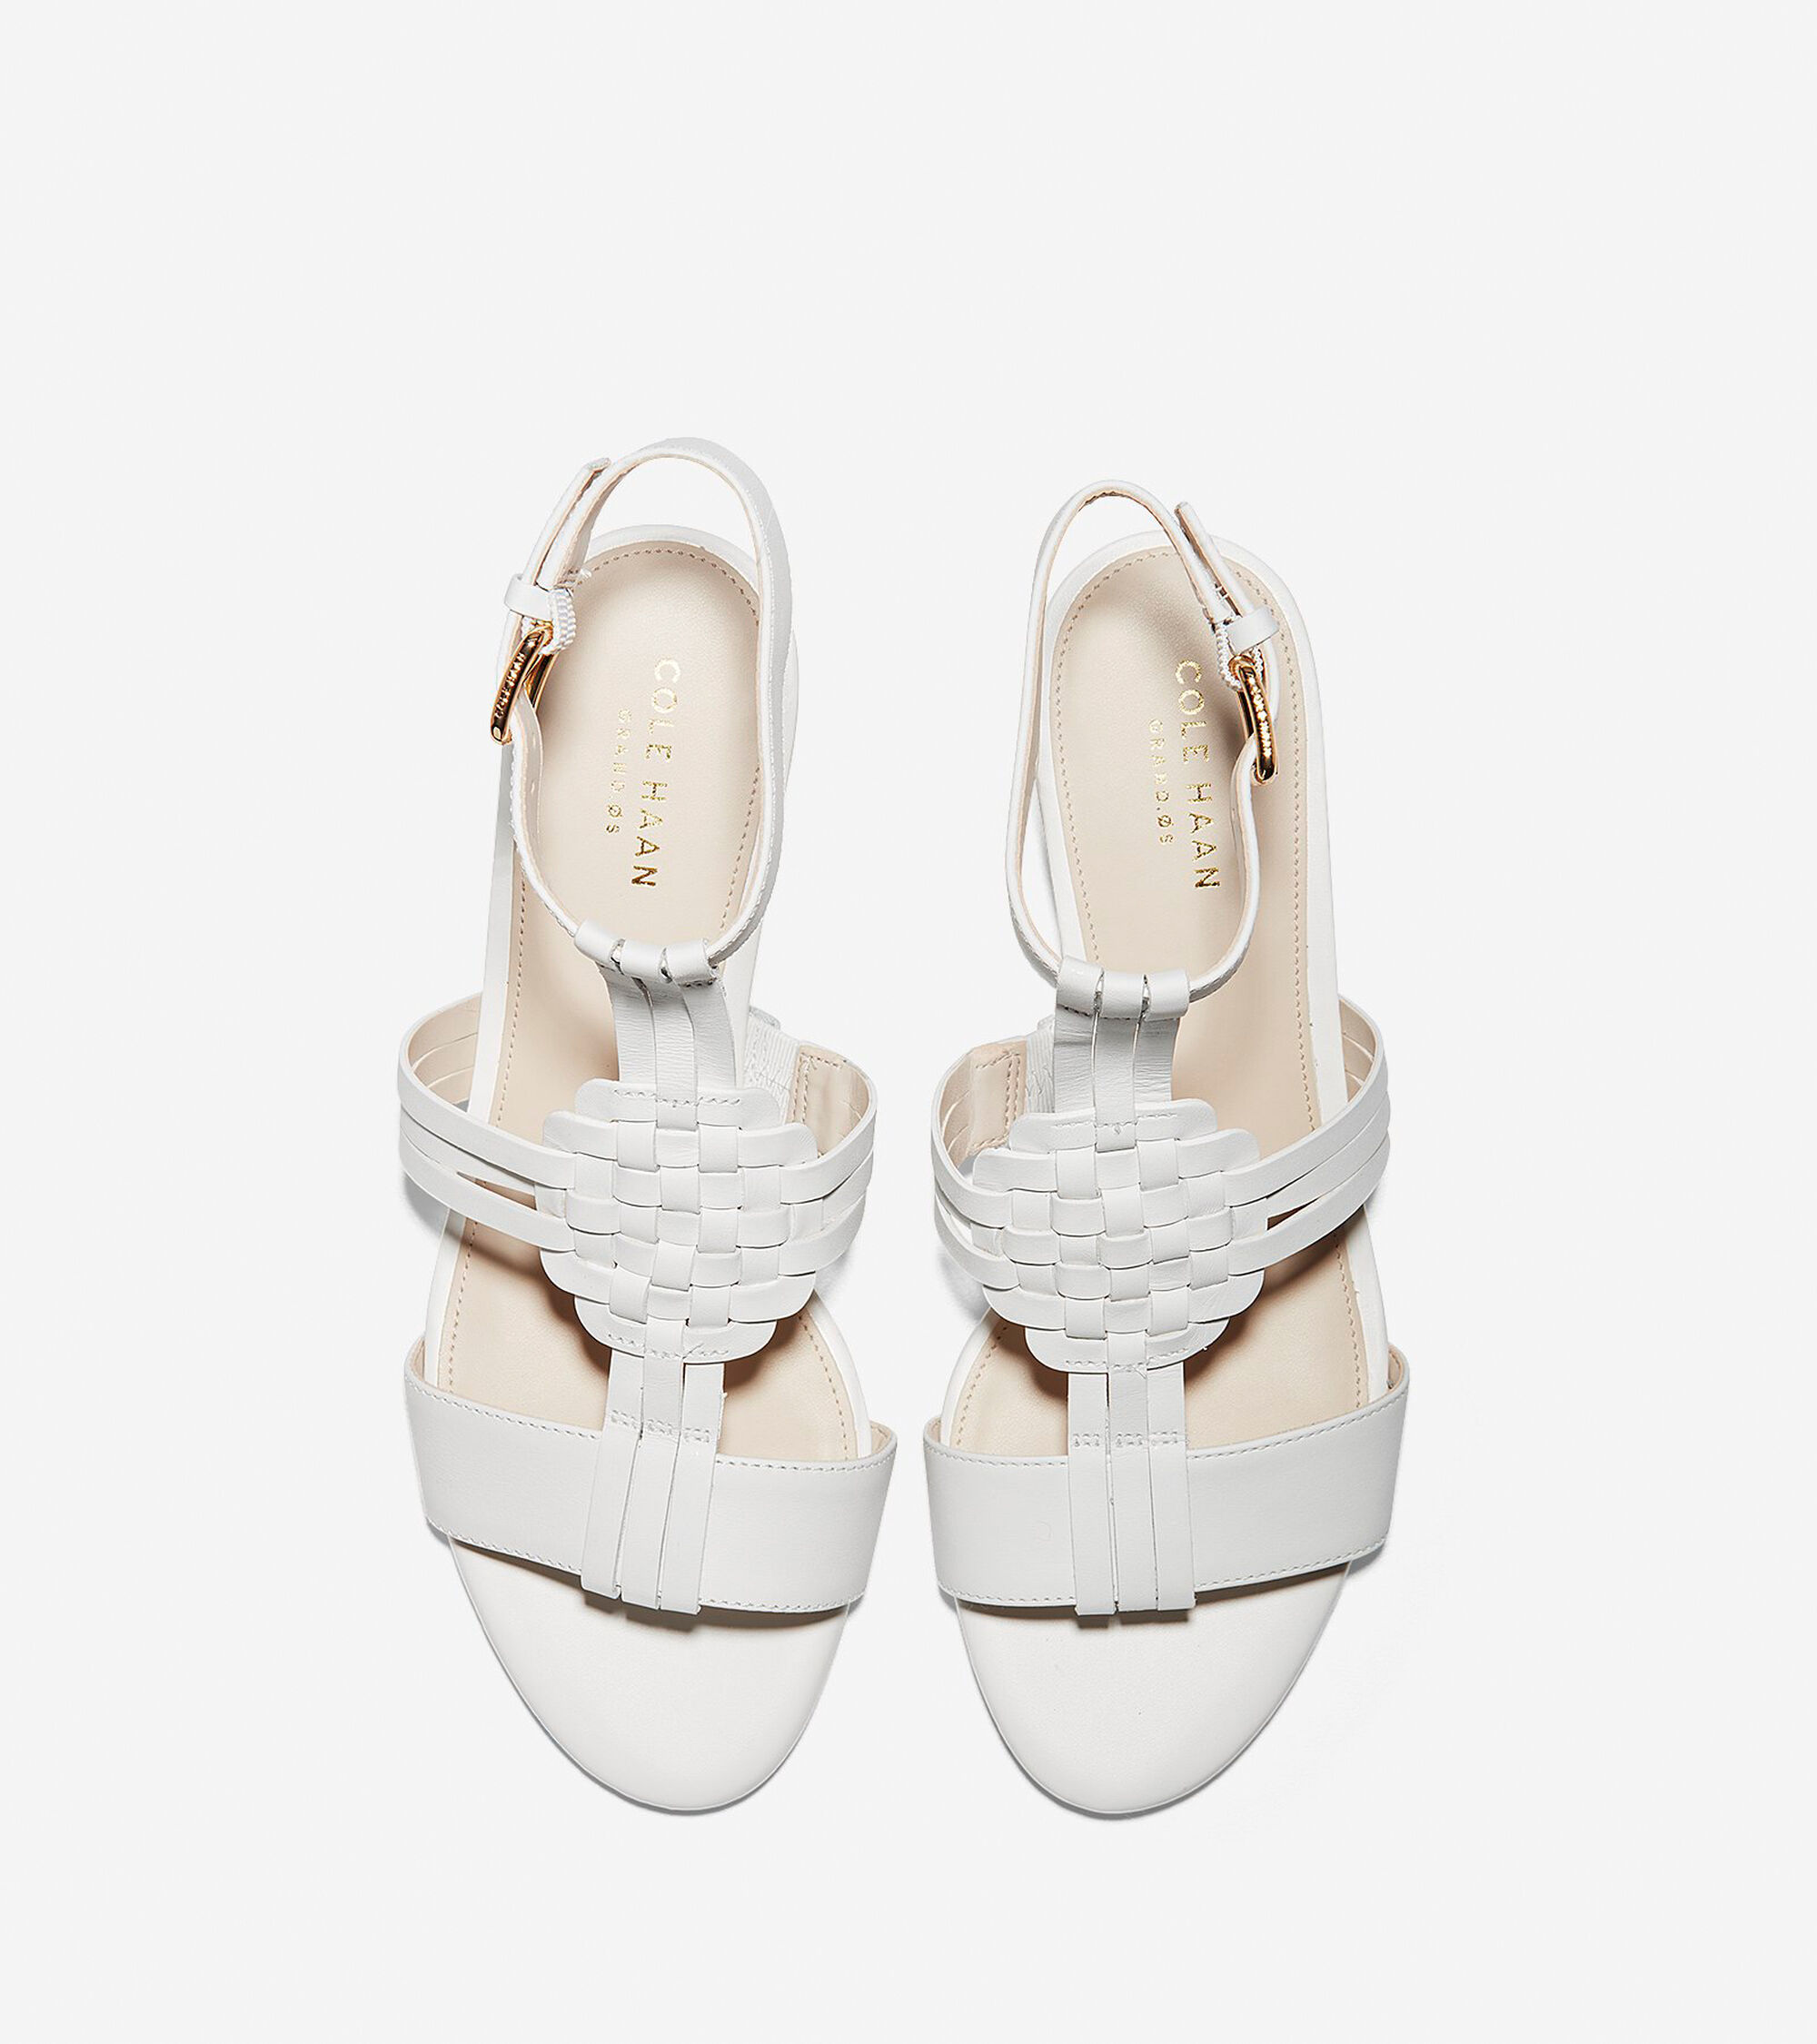 bad5dddd52c Women s Findra Woven Slide Wedge Sandals in White